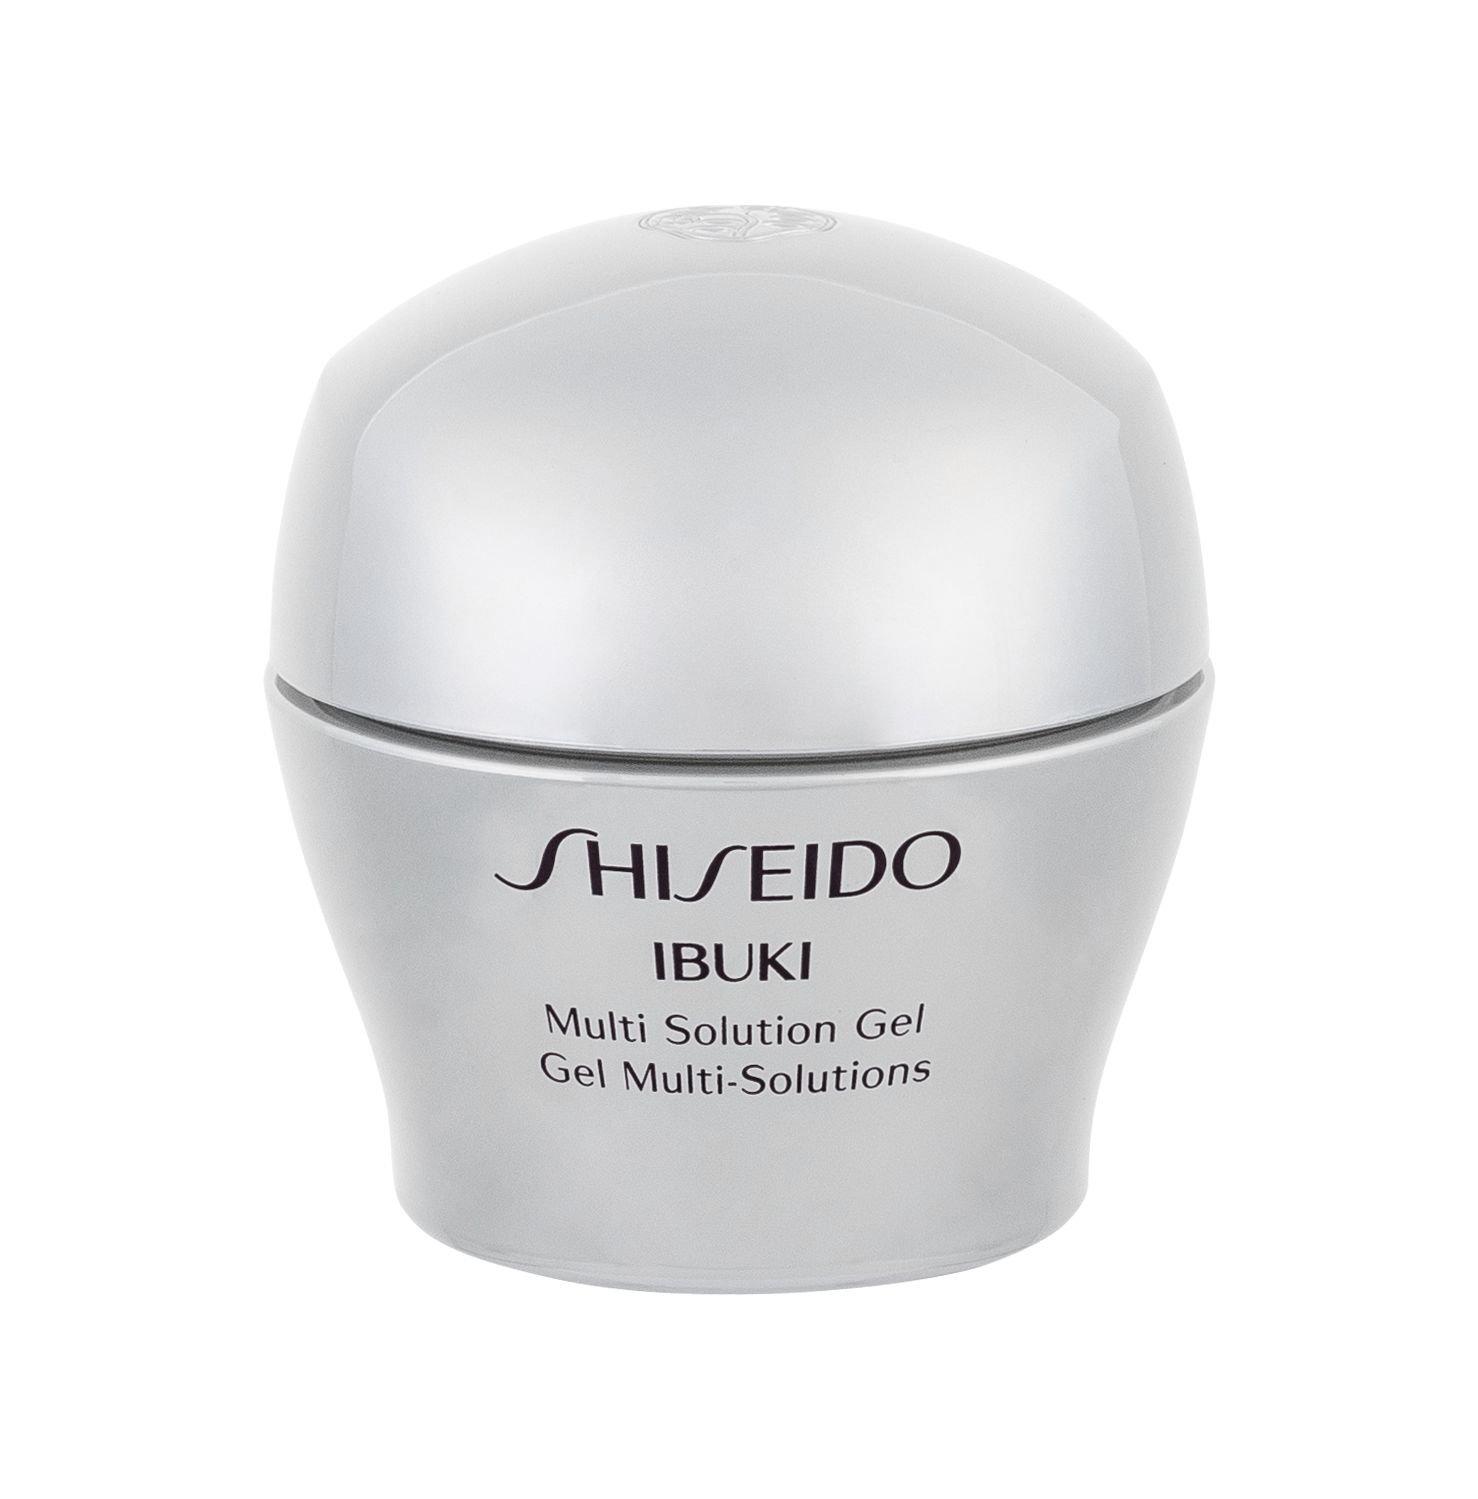 Shiseido Ibuki Facial Gel 30ml